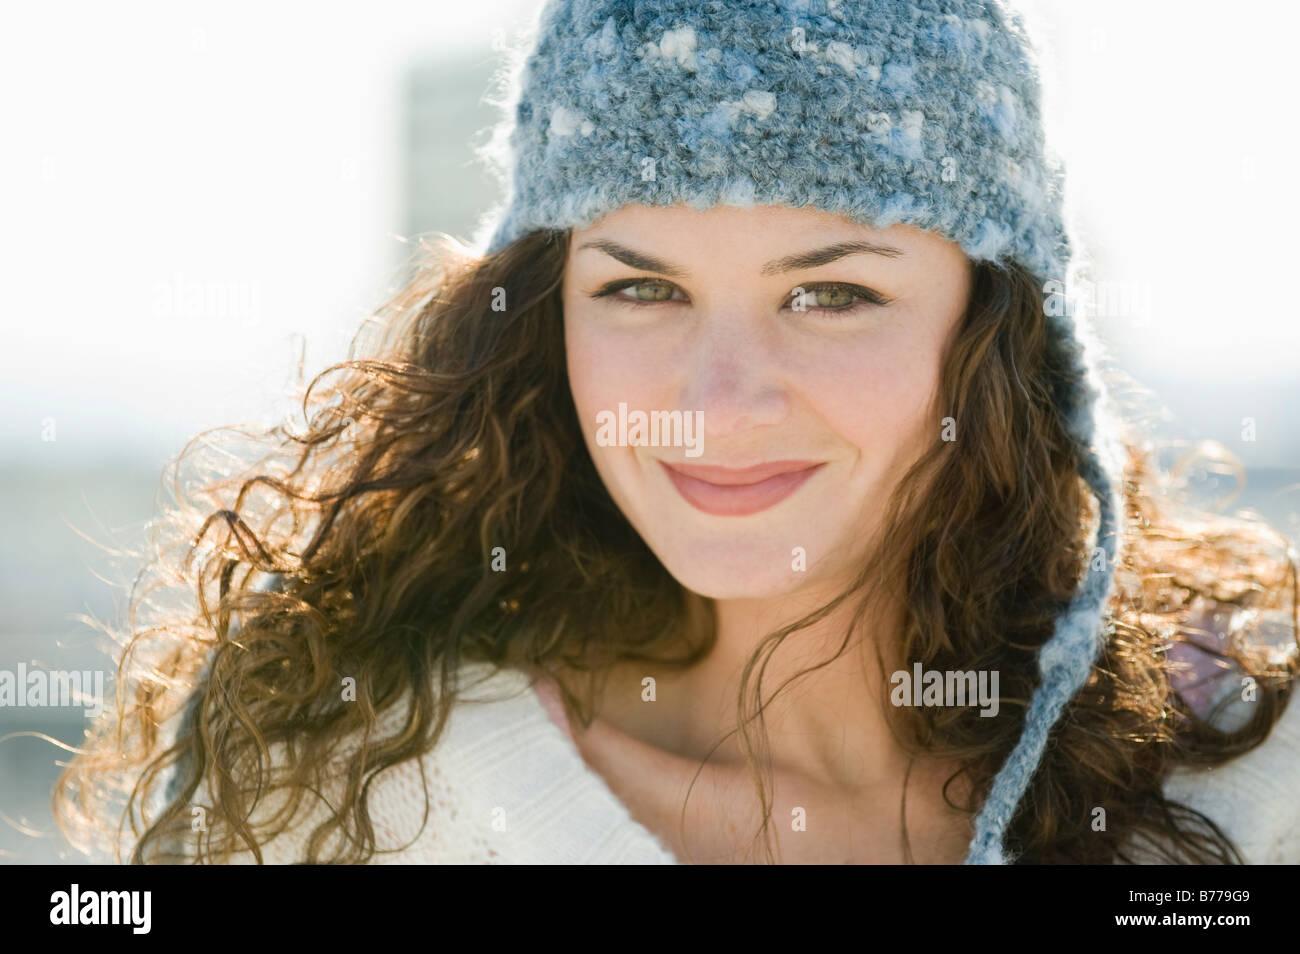 Portrait of smiling woman stocking cap - Stock Image